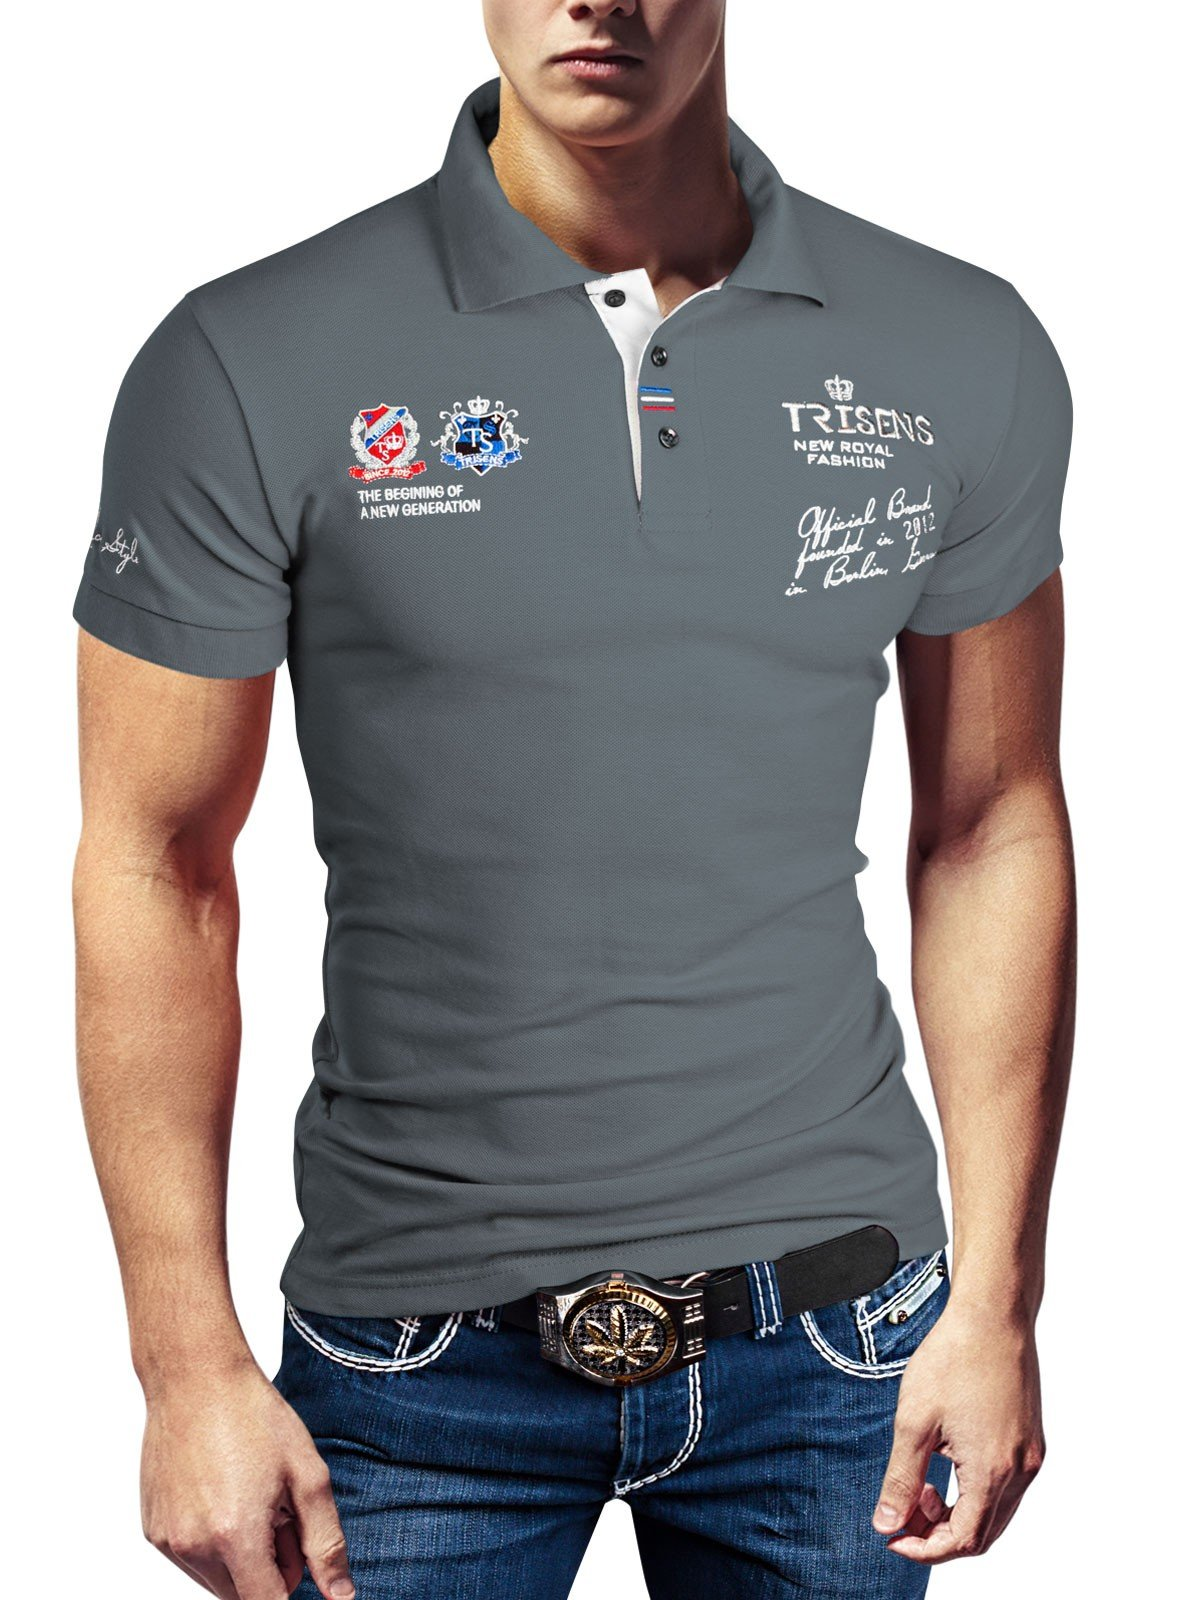 Mejor valorados en Camisetas y polos para hombre   Opiniones útiles ... e021052539ed0